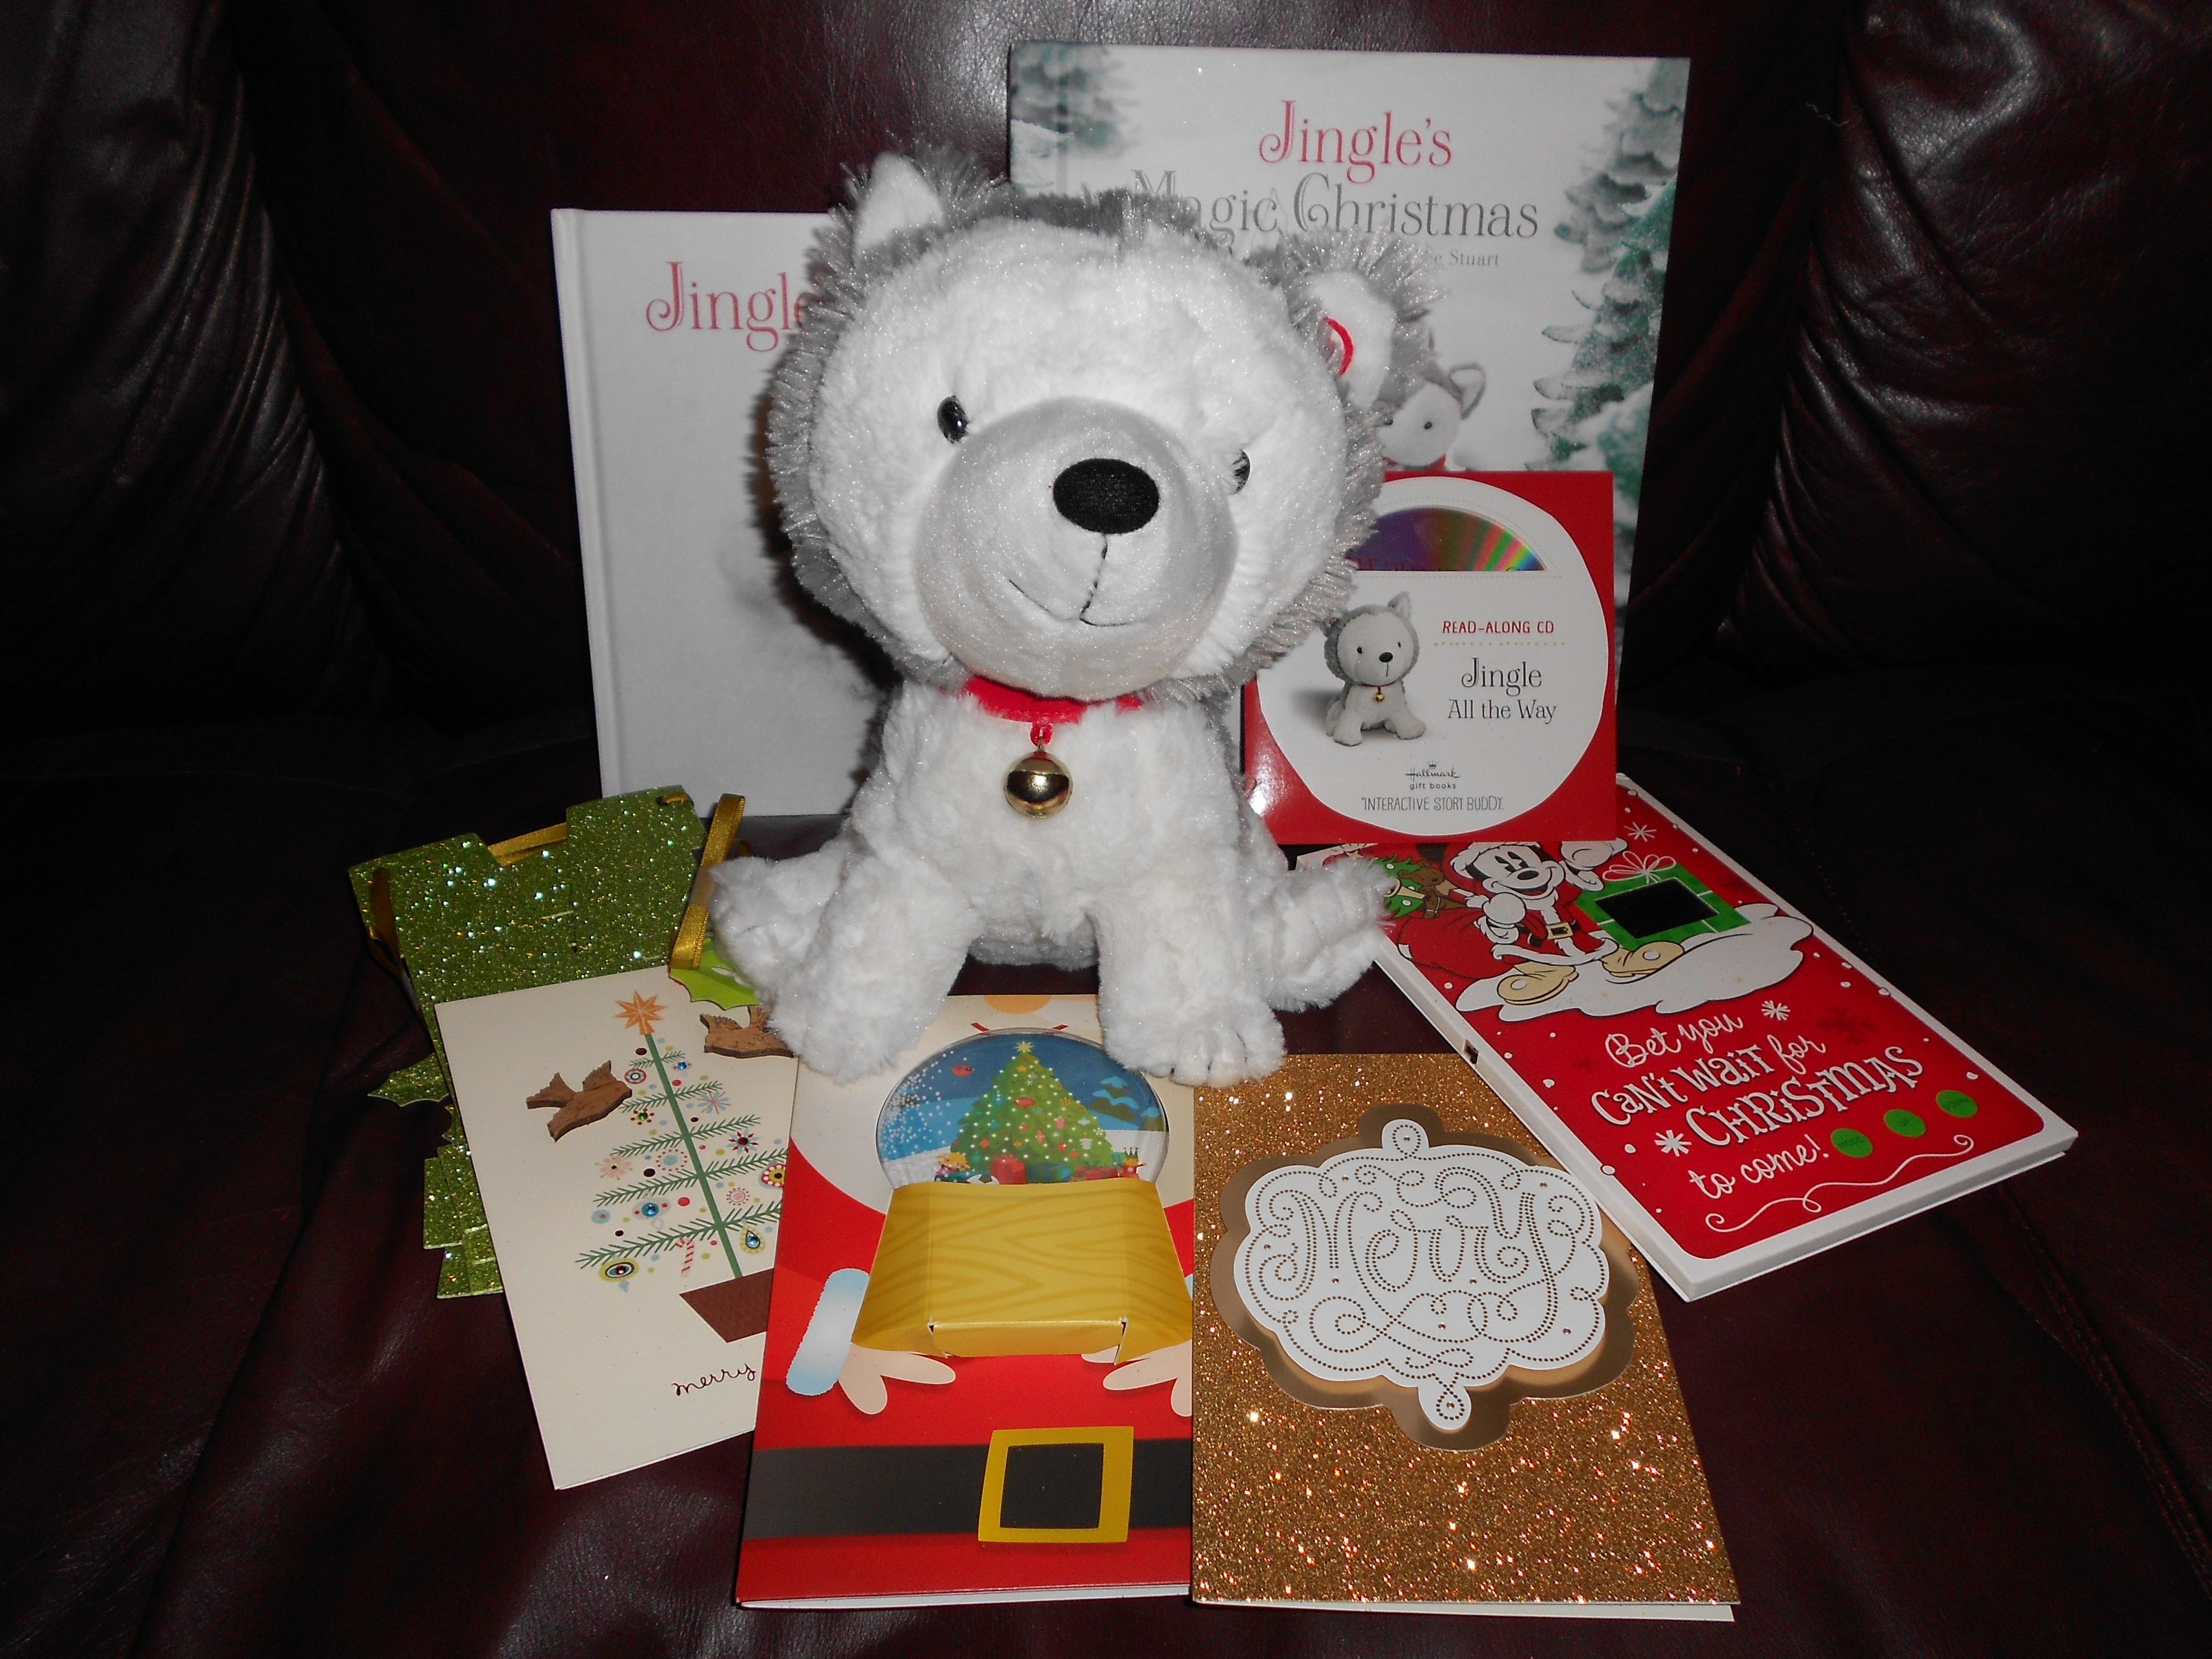 Jingle The Interactive Husky Pup And Book Jingles Magical